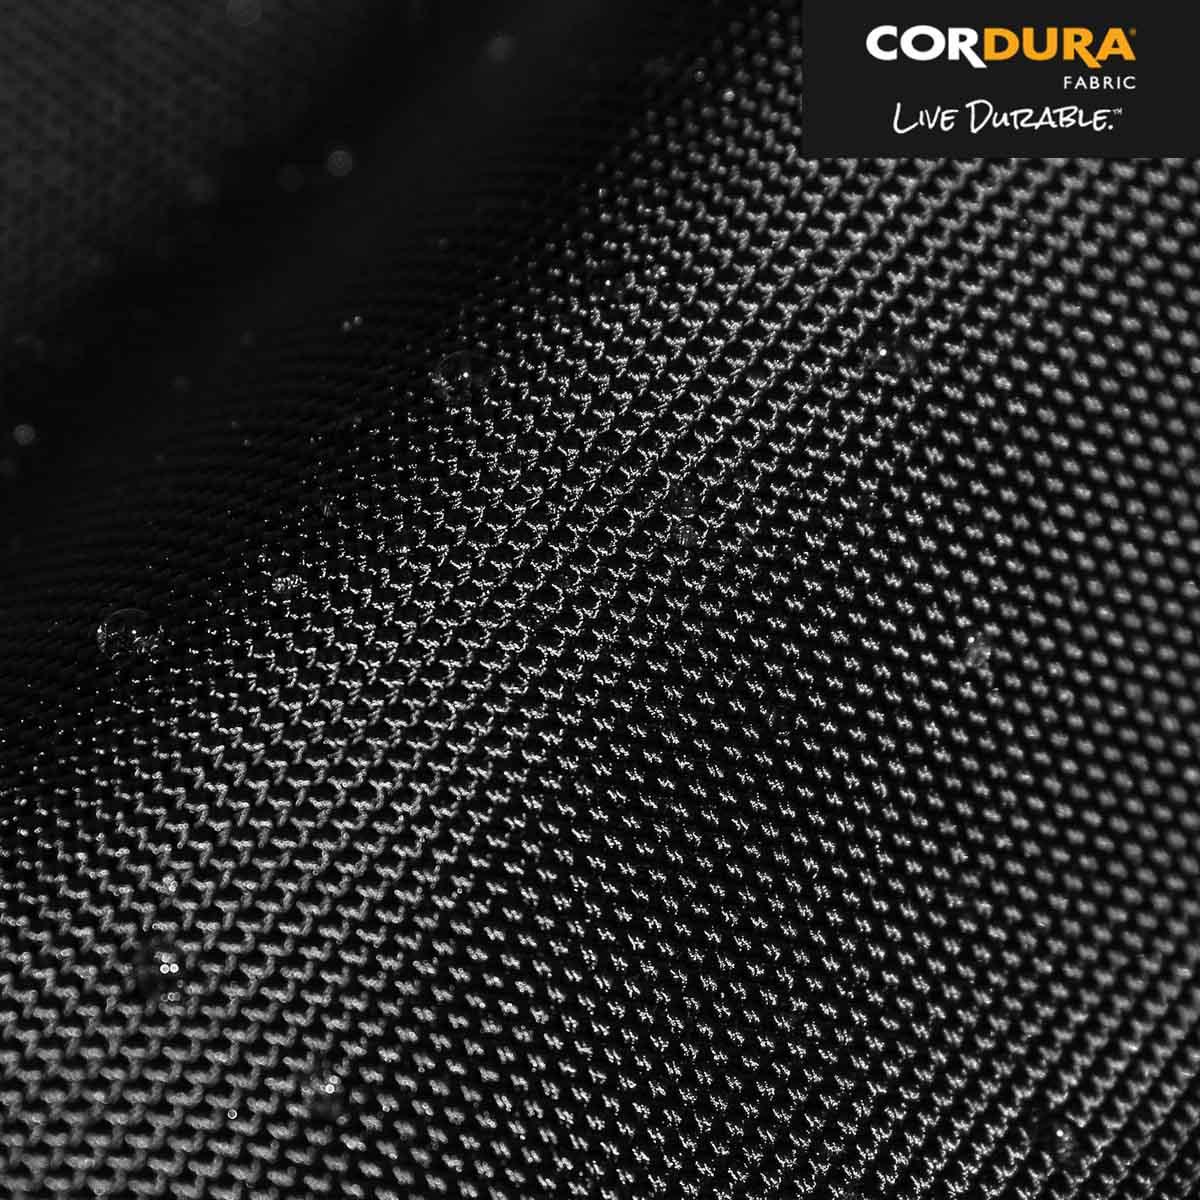 Ultra-durable, water-resistant 1680D Cordura® ballistic nylon exterior (originally developed for military body armor).